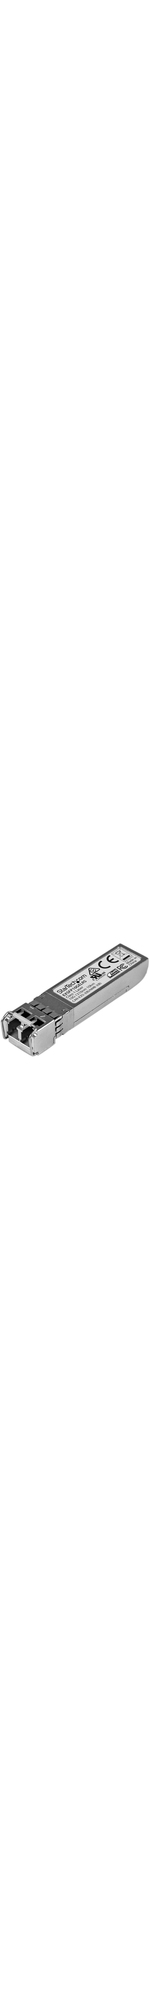 StarTech.com Juniper EX-SFP-10GE-LR Compatible SFPplus Module - 10GBASE-LR Fiber Optical SFP Transceiver - Lifetime Warranty - 10 Gbps - Maximum Transfer Distance: 300